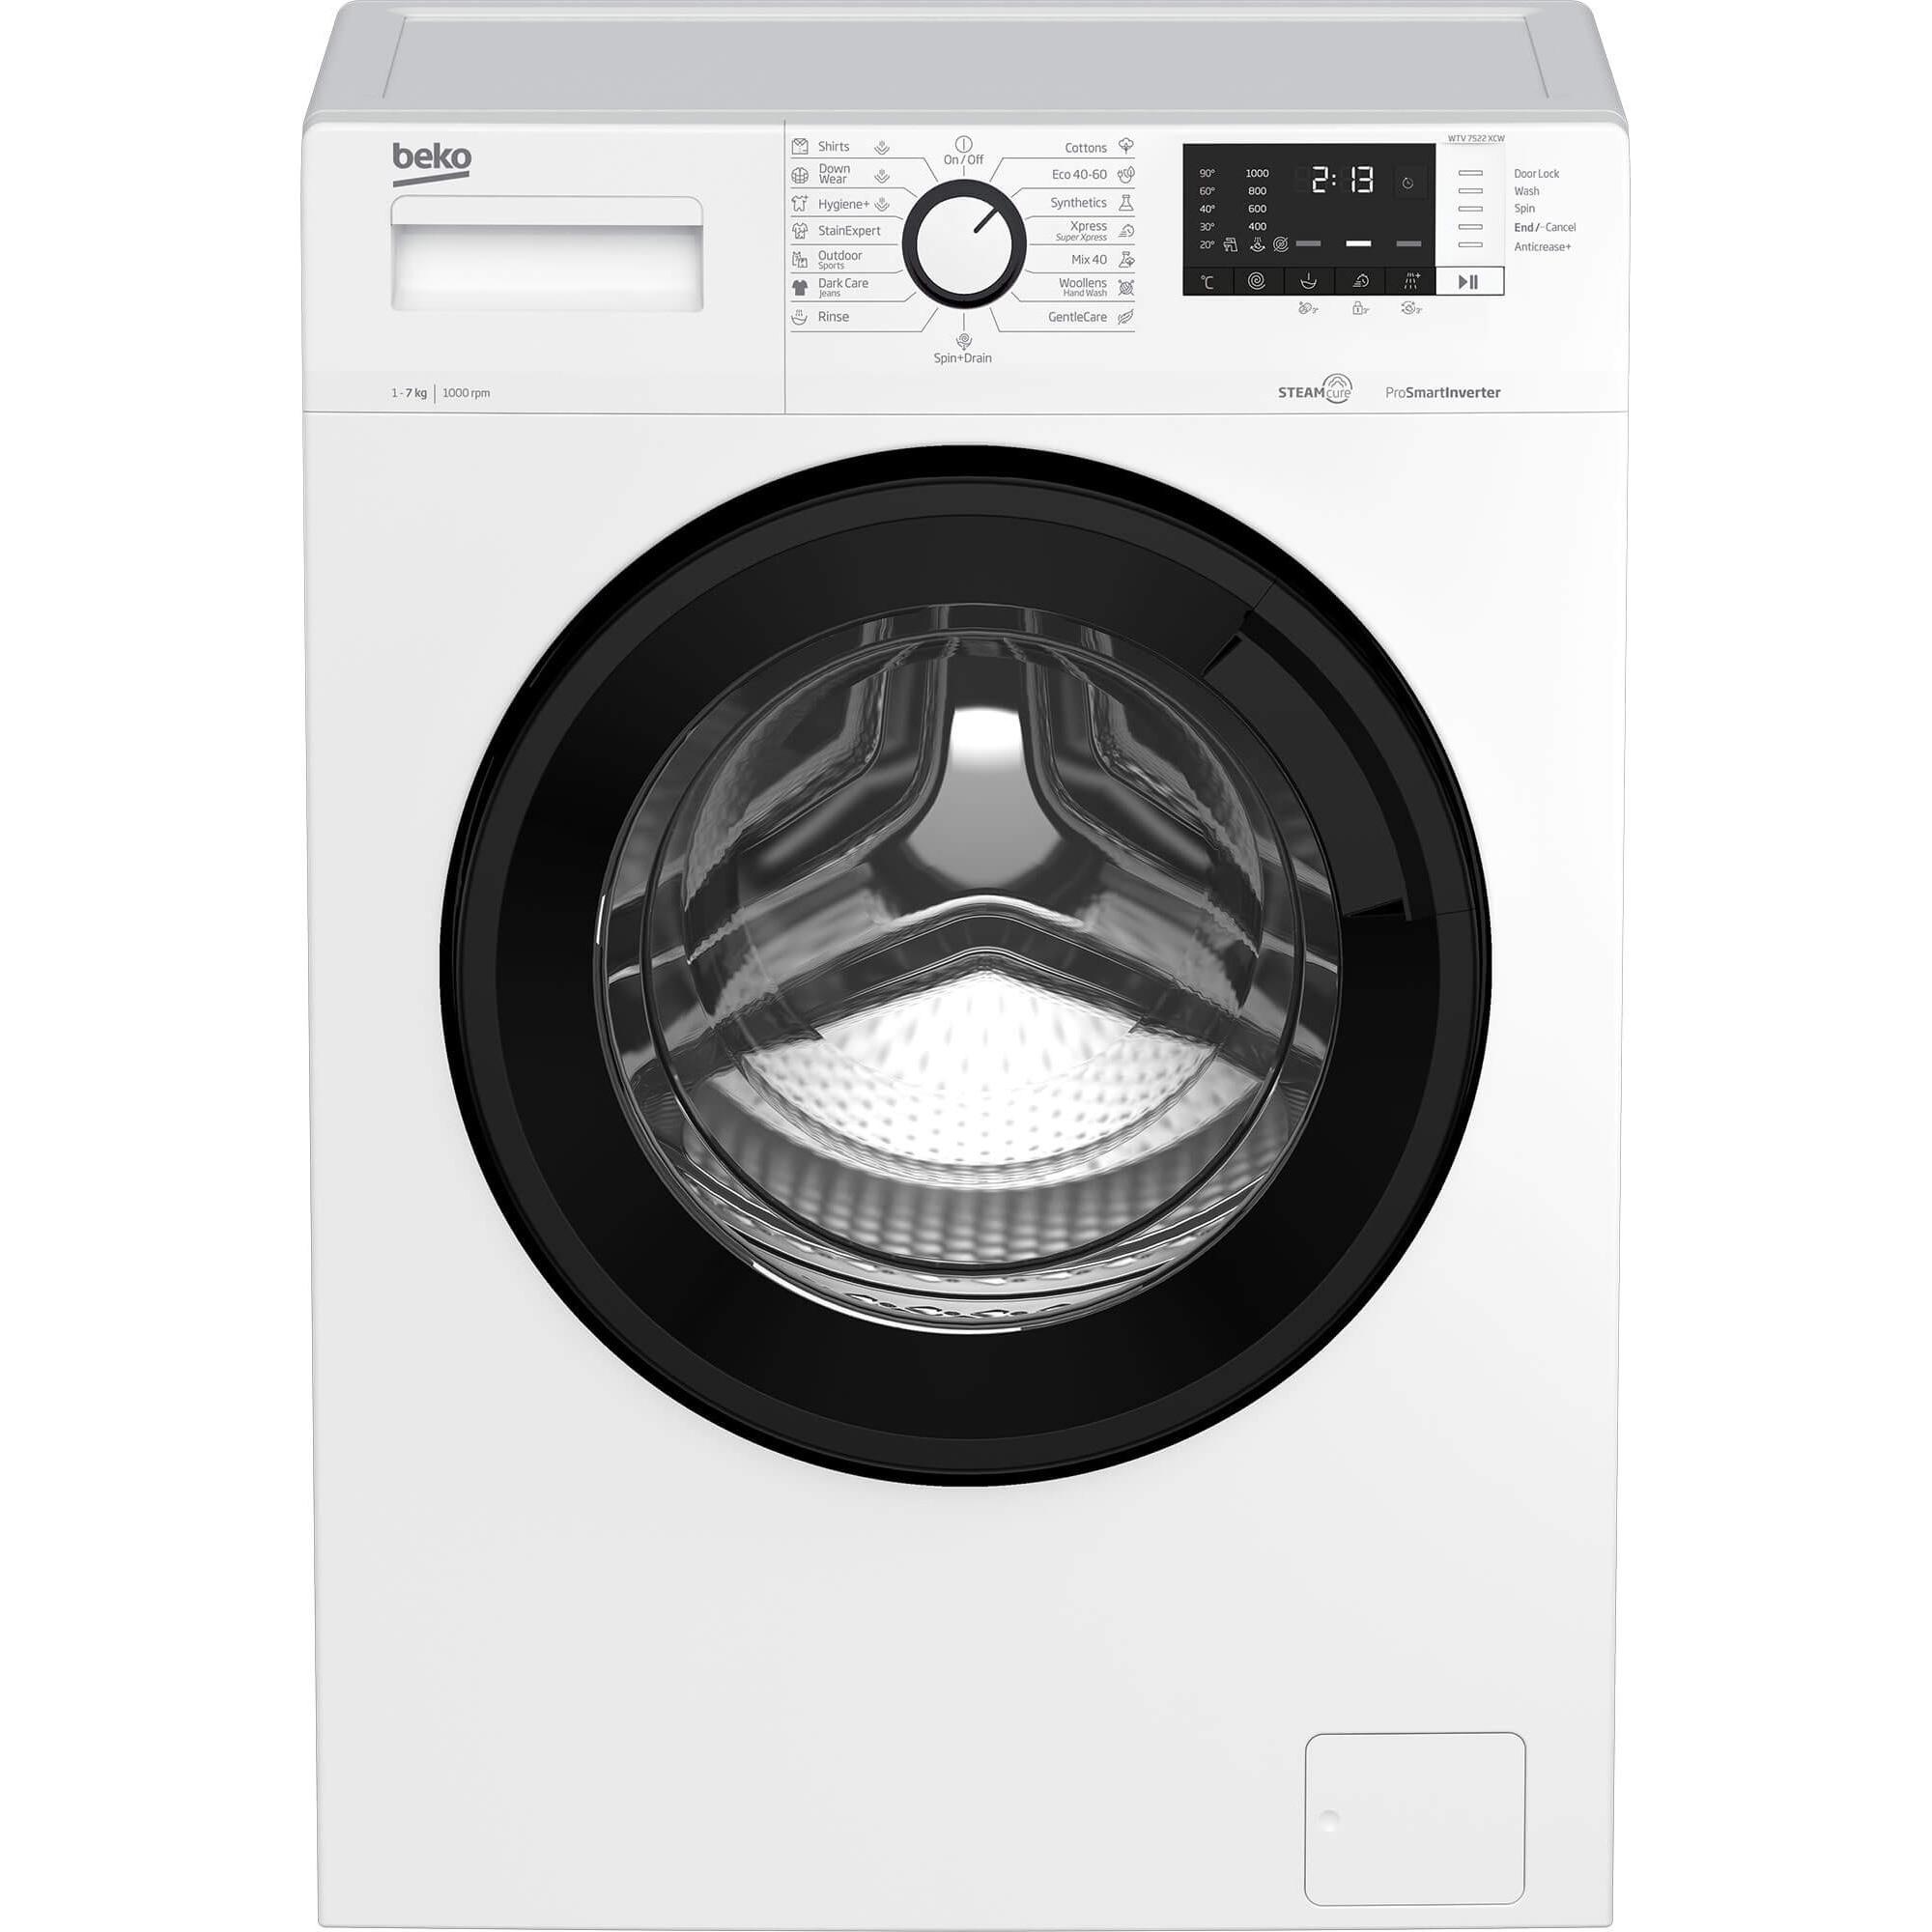 Fotografie Masina de spalat rufe Beko WTV 7522 XCW, 7 kg, 1000 RPM, Clasa D, Motor ProSmart Inverter, SteamCure, Hygiene+, Alb